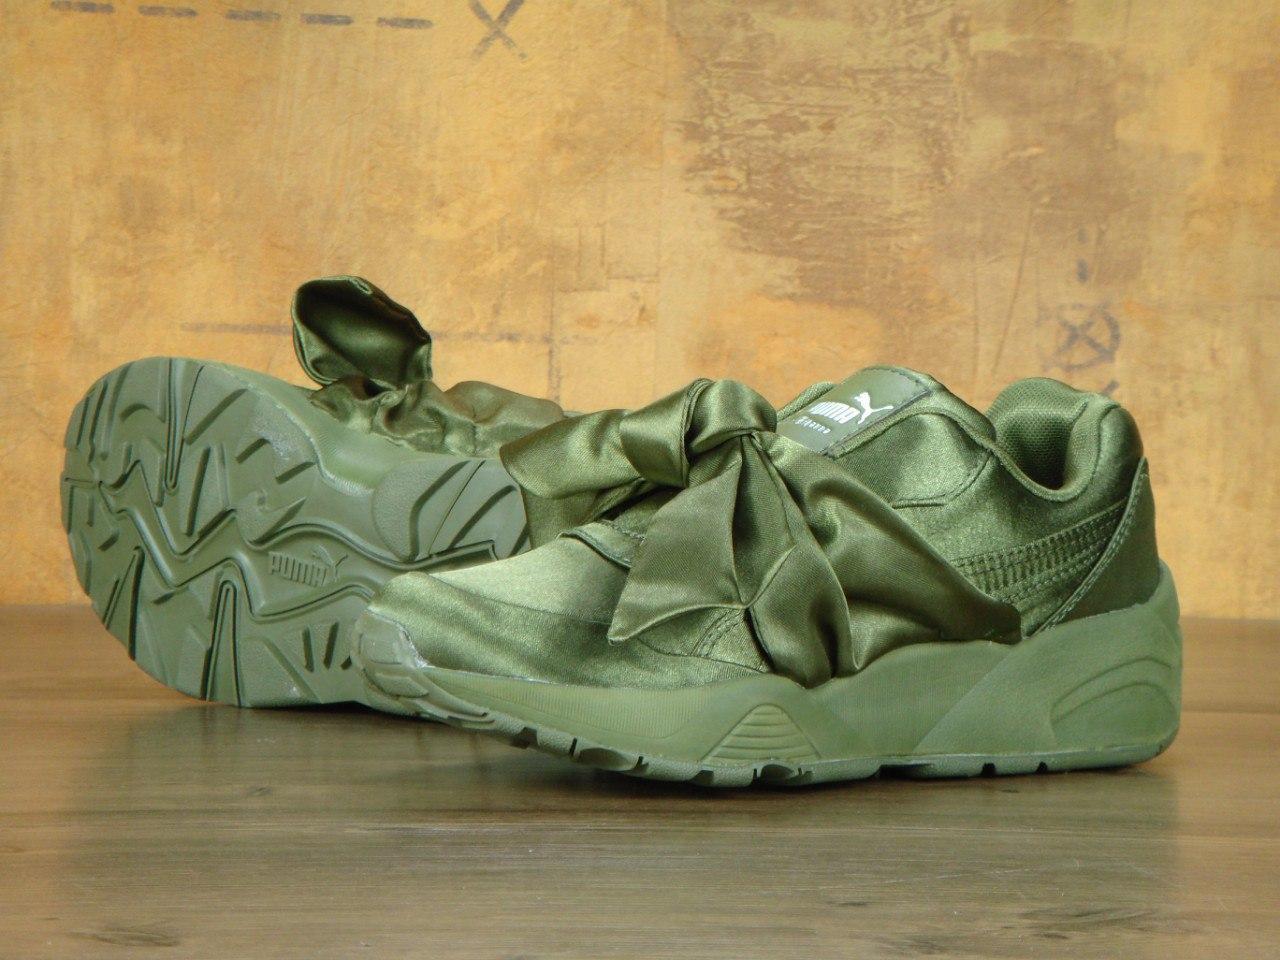 Кроссовки женские Fenty By Rihanna Bow Sneaker Pink 30465 темно-зеленые